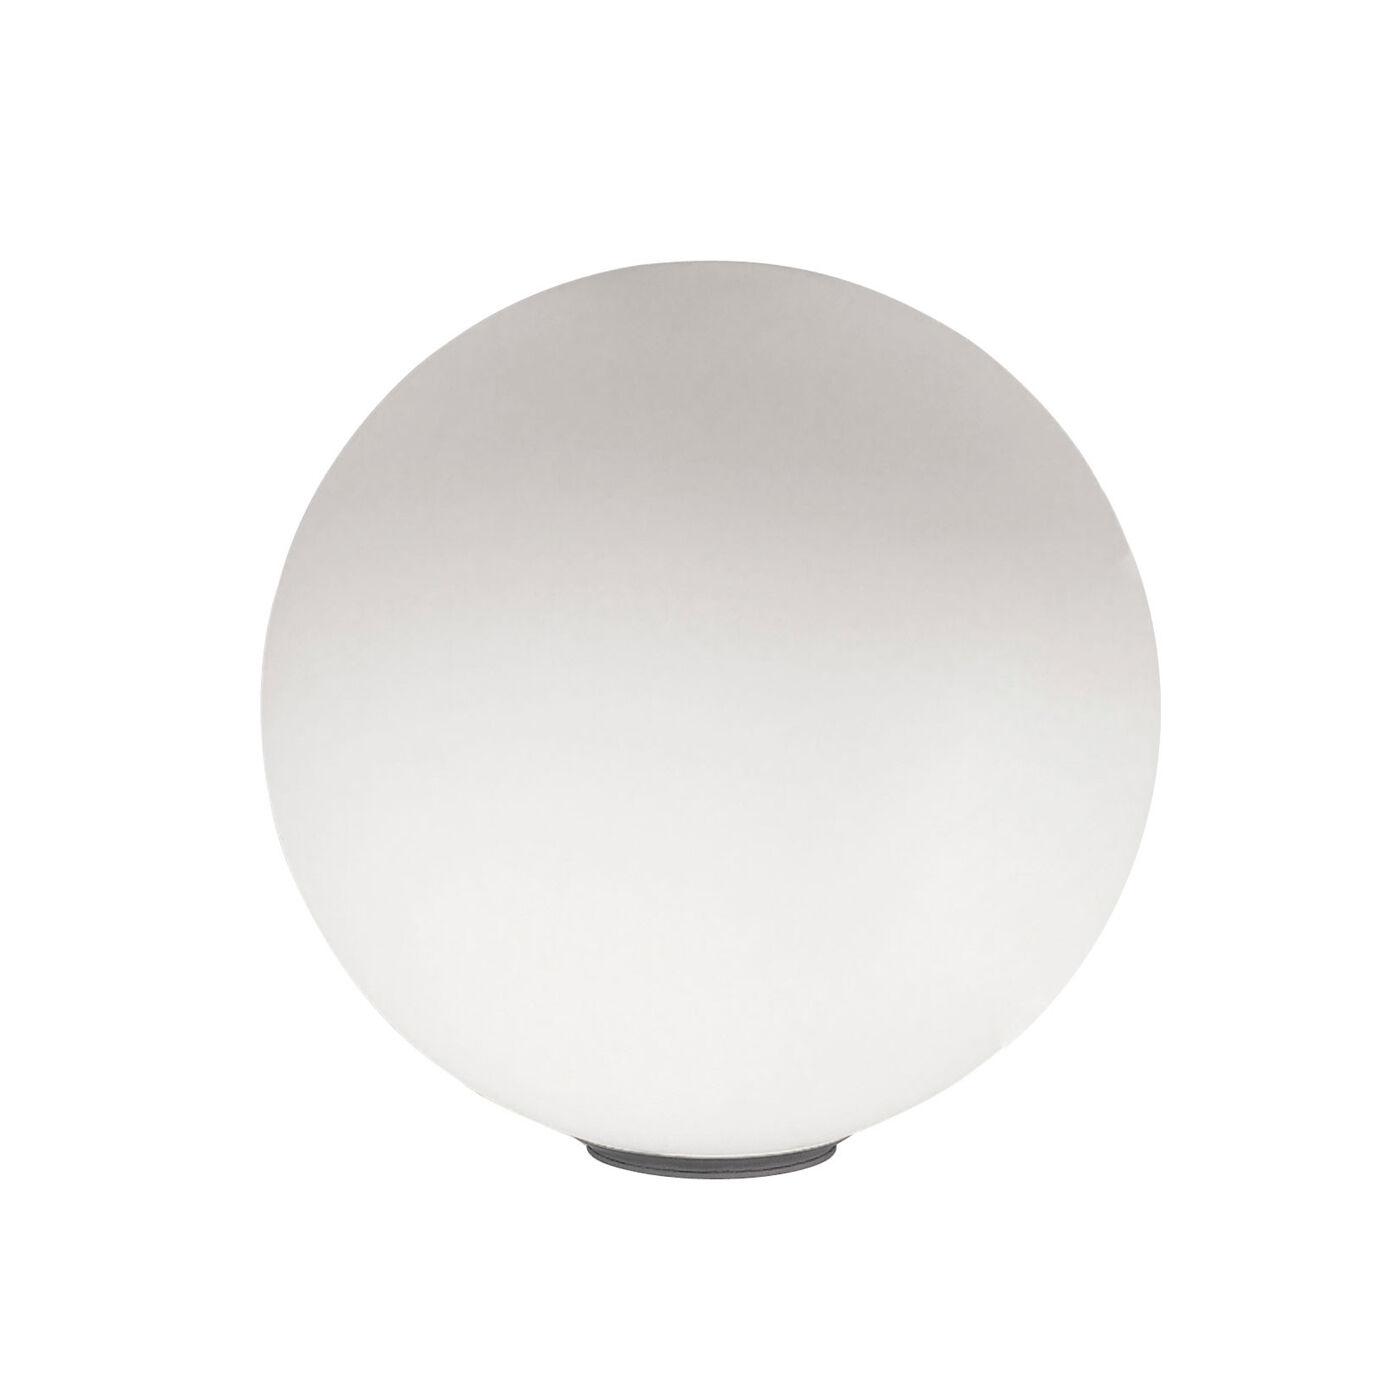 ARTEMIDE lampe de table DIOSCURI 42 (Ø 42 cm - Verre soufflé, polycarbonate, acier)